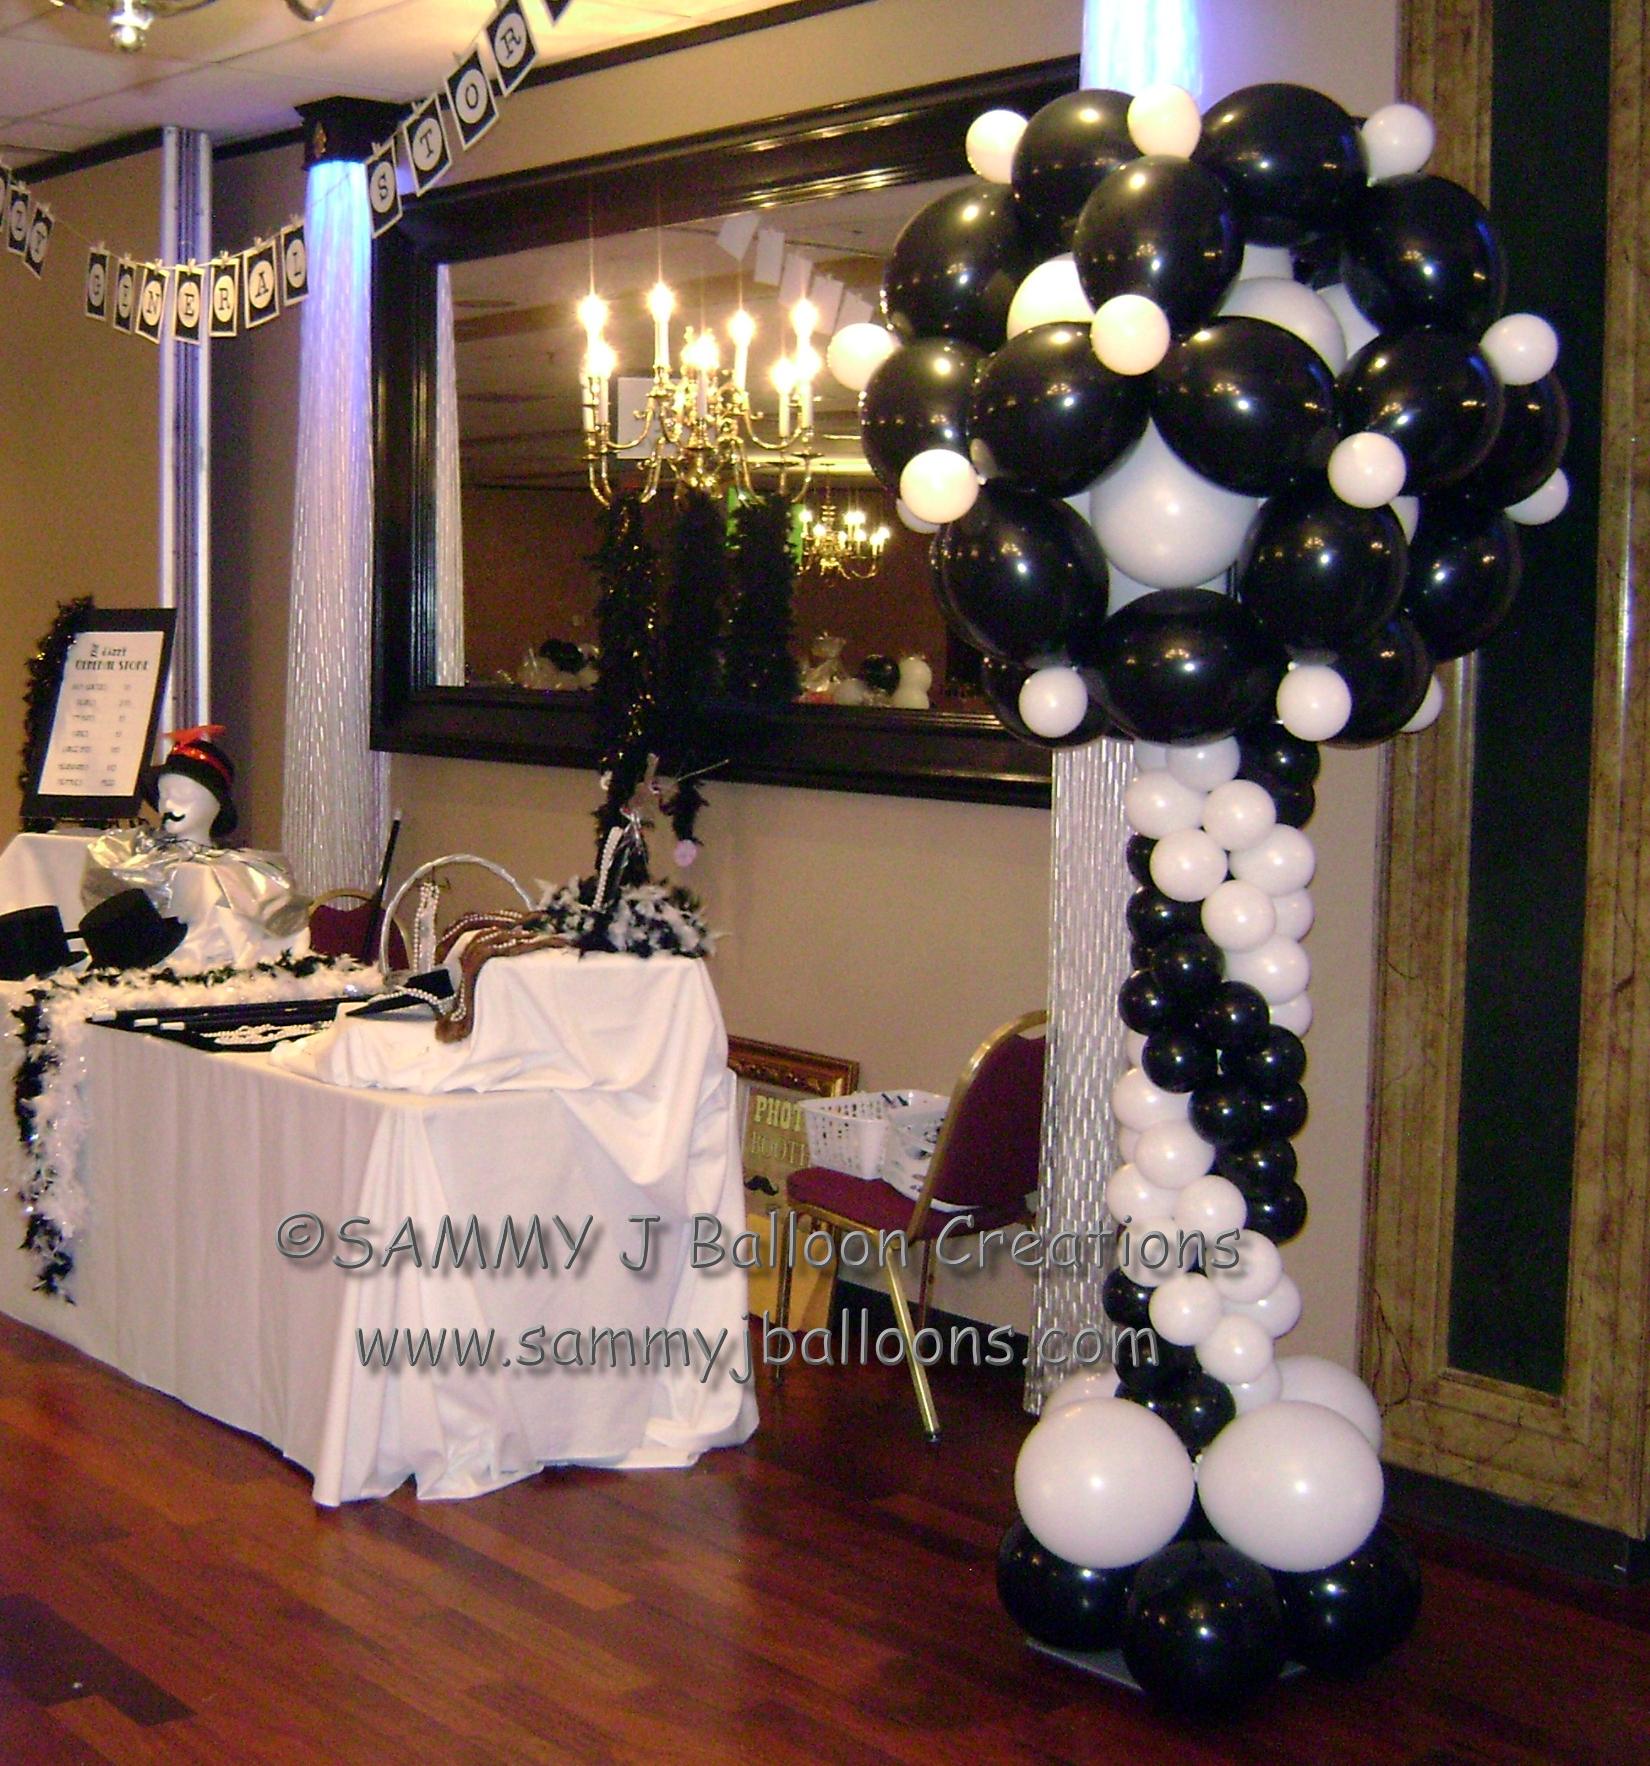 SAMMY J Balloon Creations st louis balloons link o loon topiary column